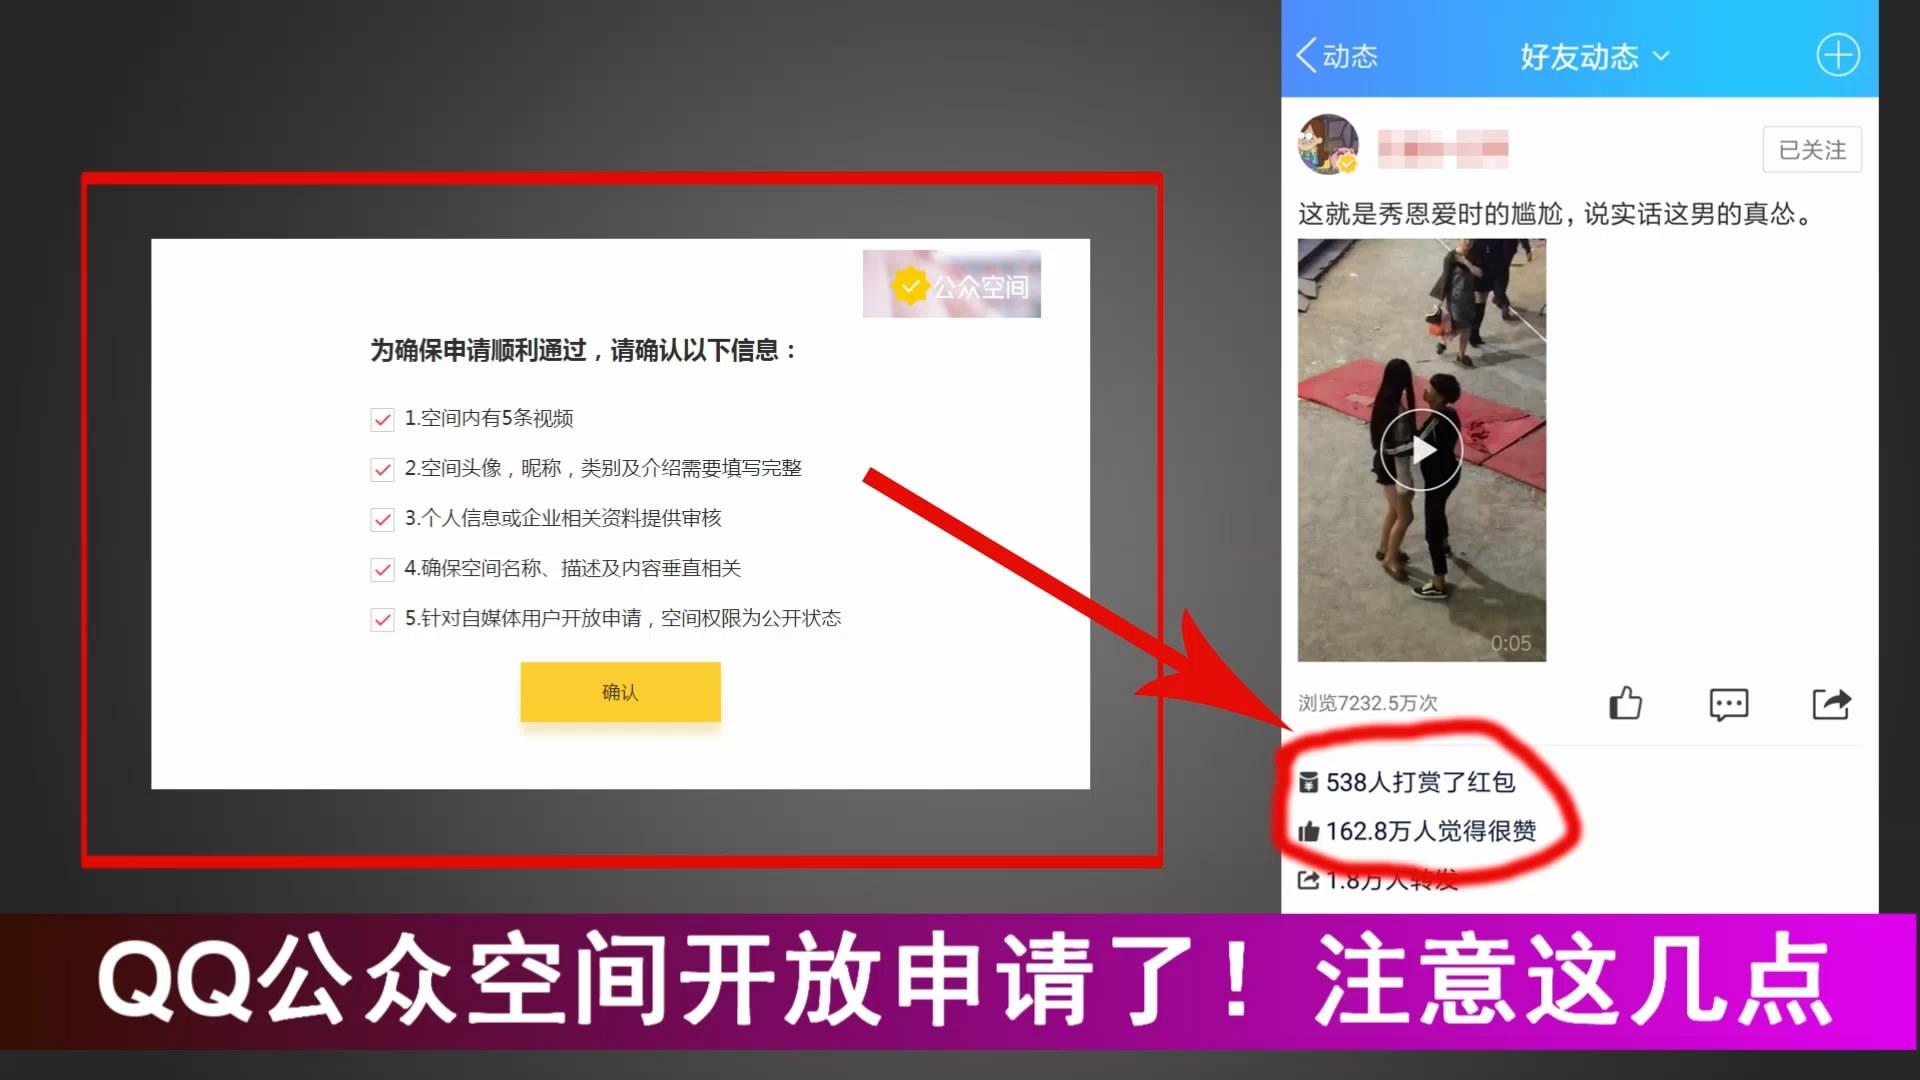 QQ公众空间开放申请了,注意这几点才能通过哟!